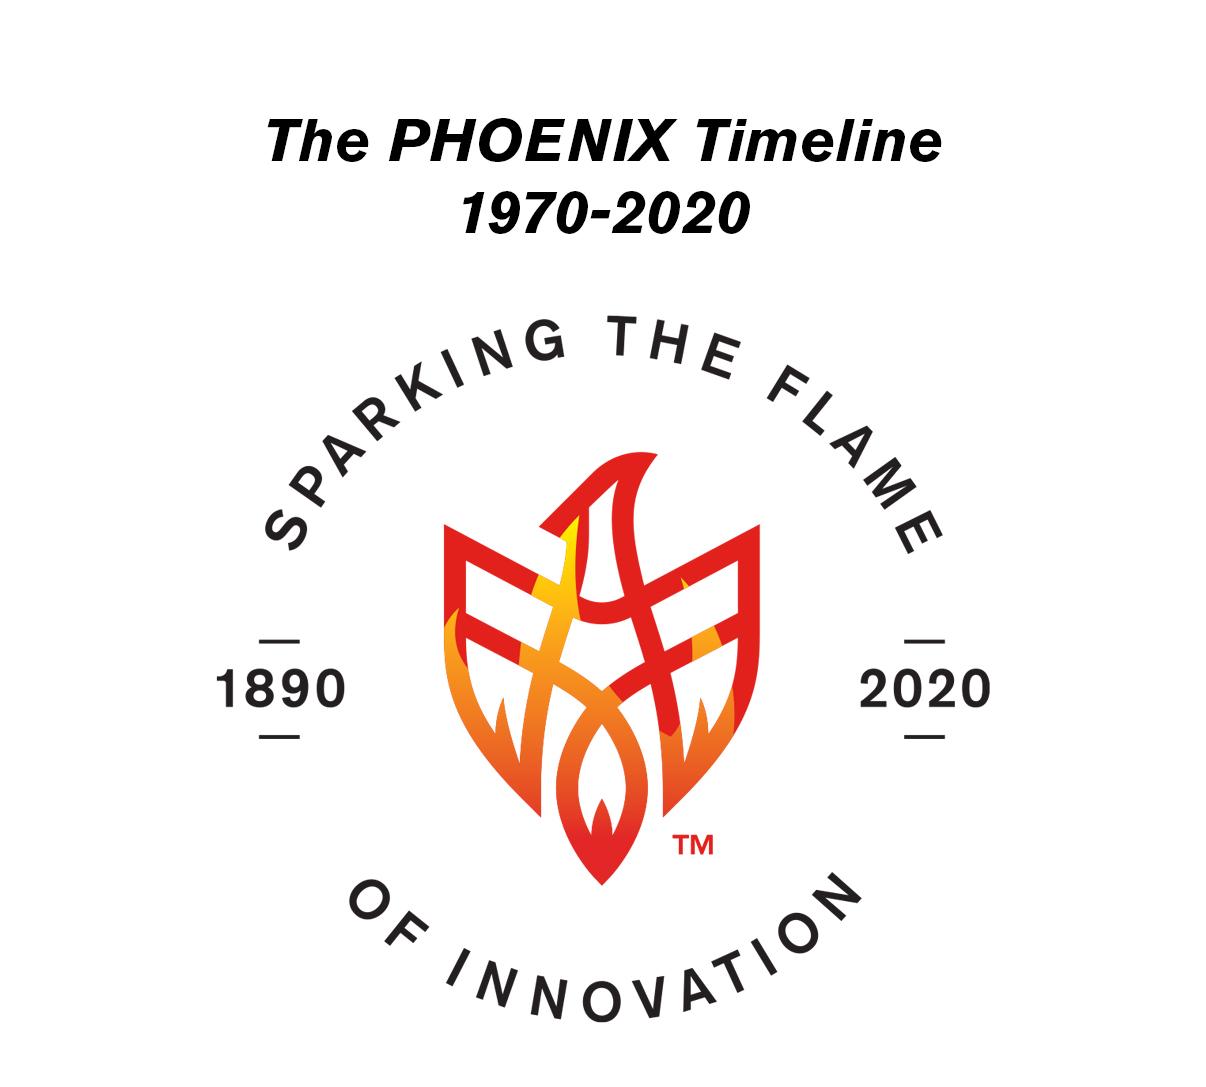 PHOENIX Celebrates 130 Years: 1970-2020 Timeline